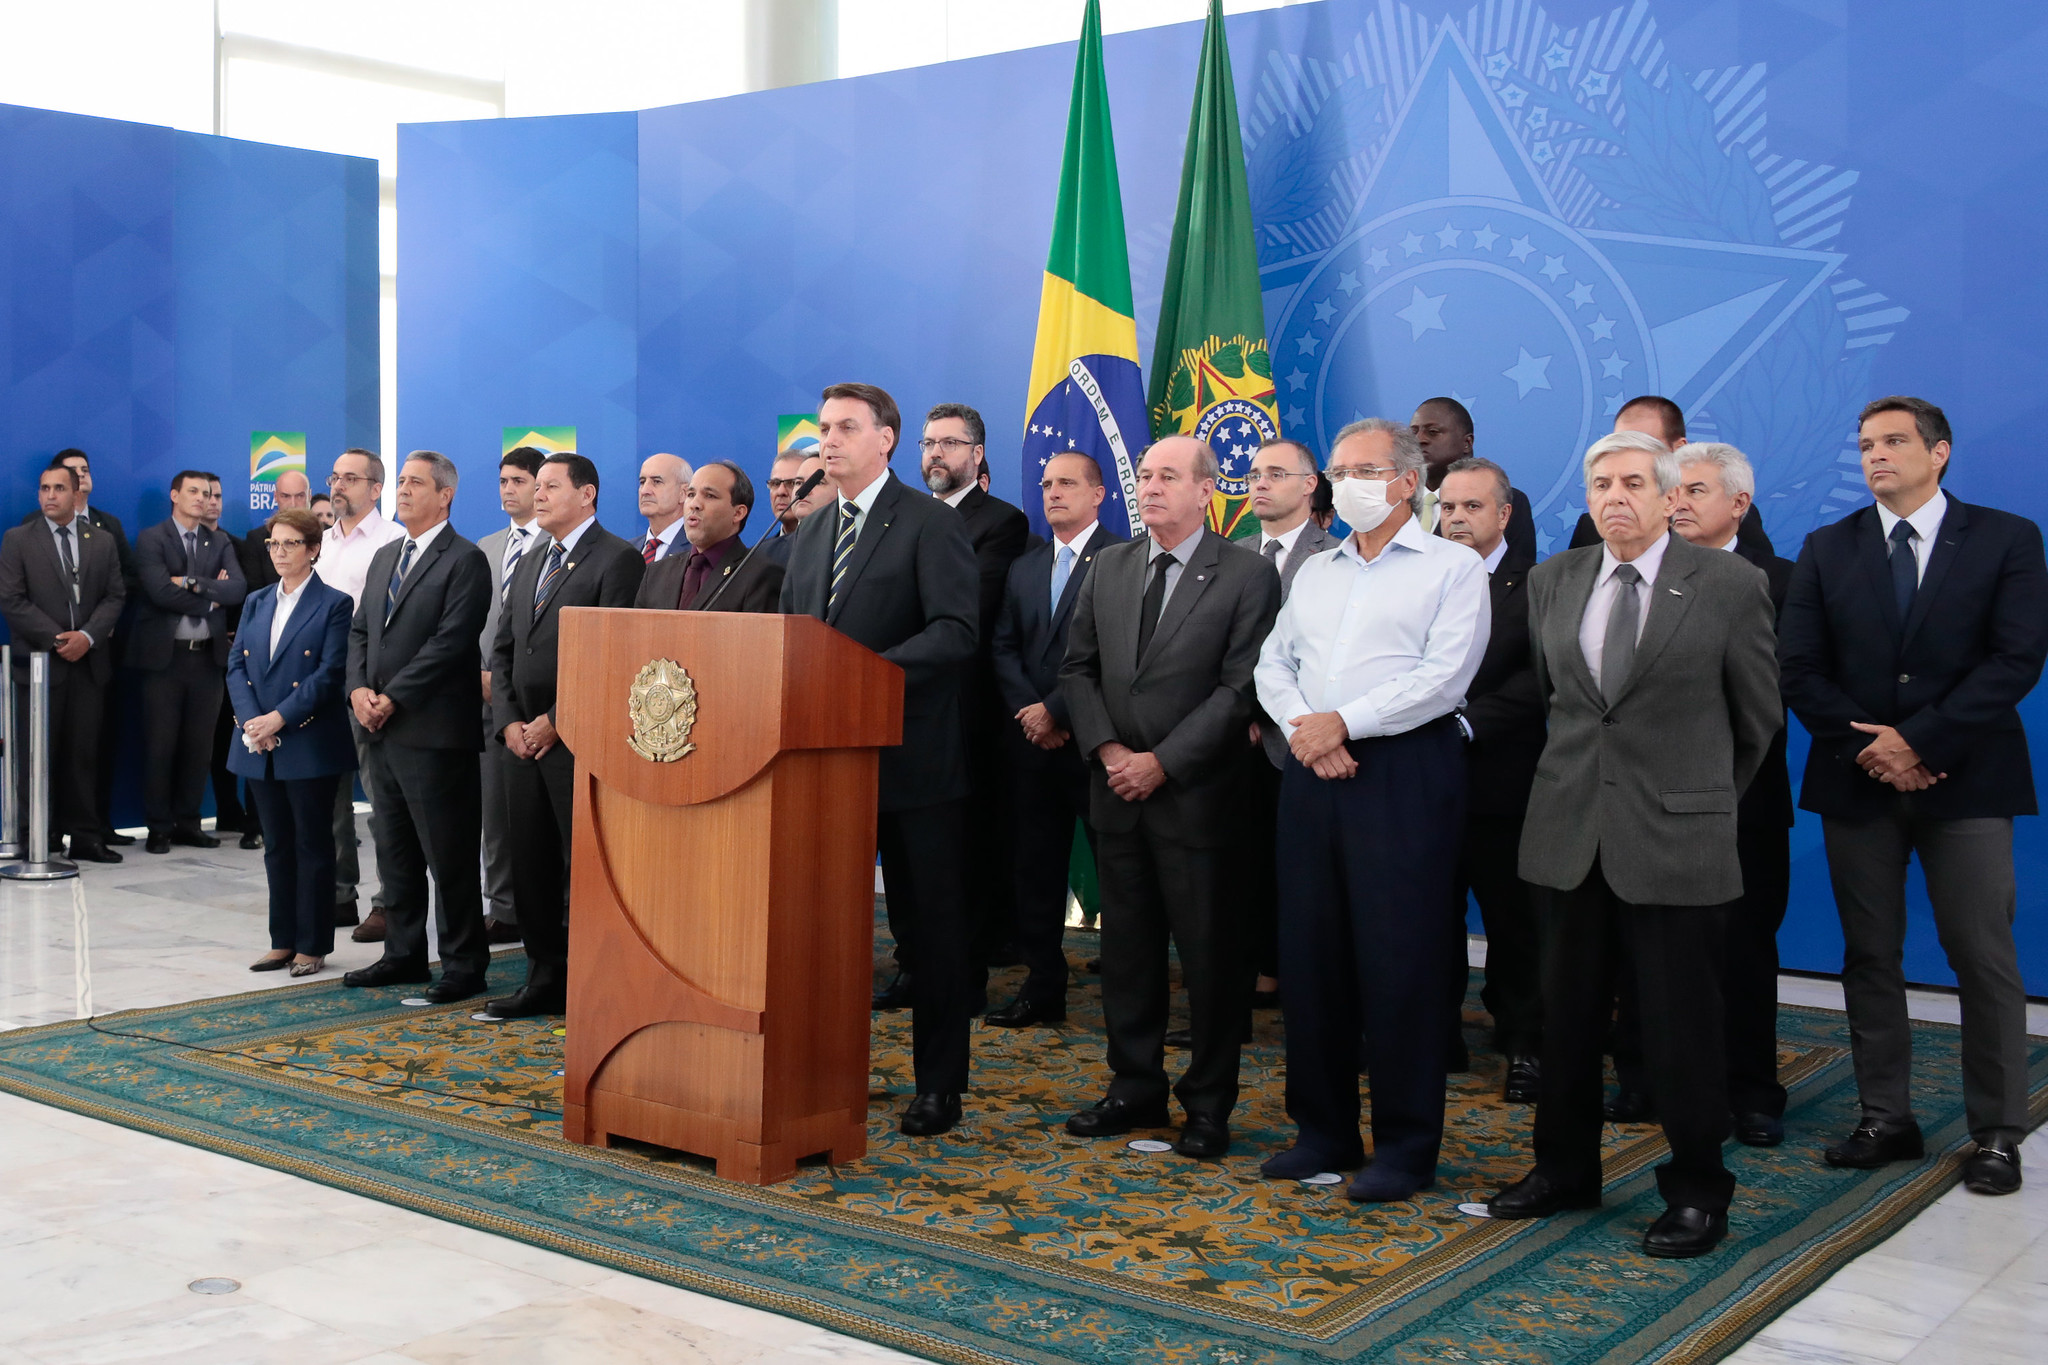 24.04.2020 - Brasília/DF - Pronunciamento do Presidente da República, Jair Bolsonaro. Foto: Carolina Antunes/PR